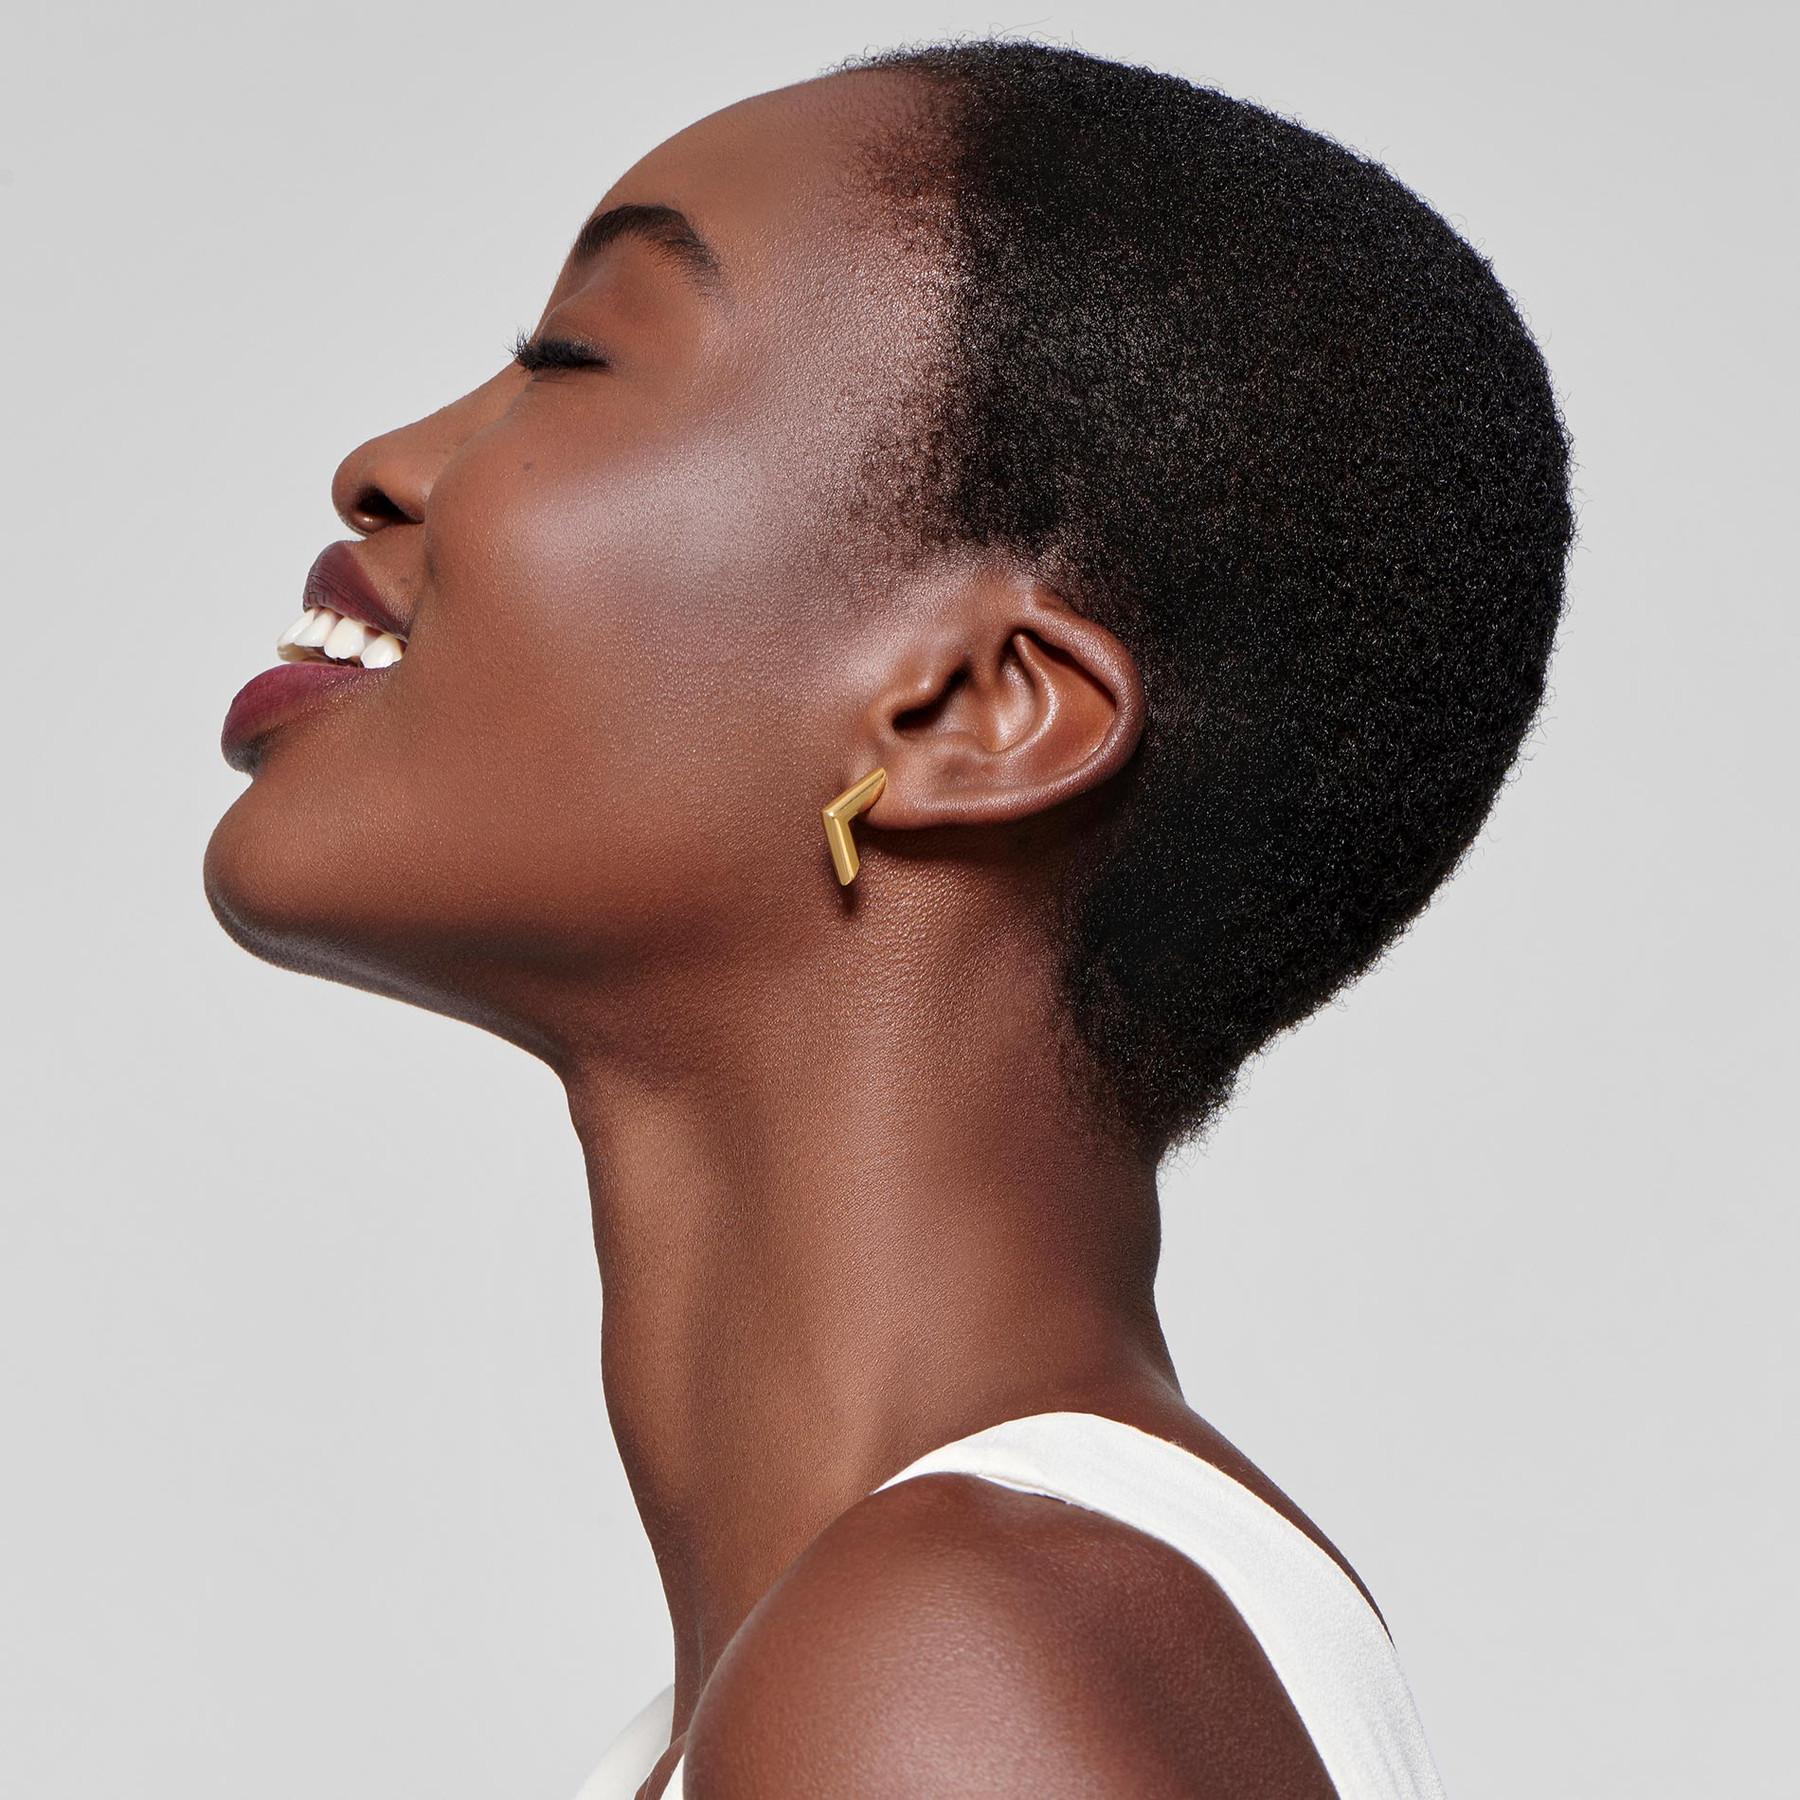 smiling black model in profile displaying 22 karat gold earrings in angular design